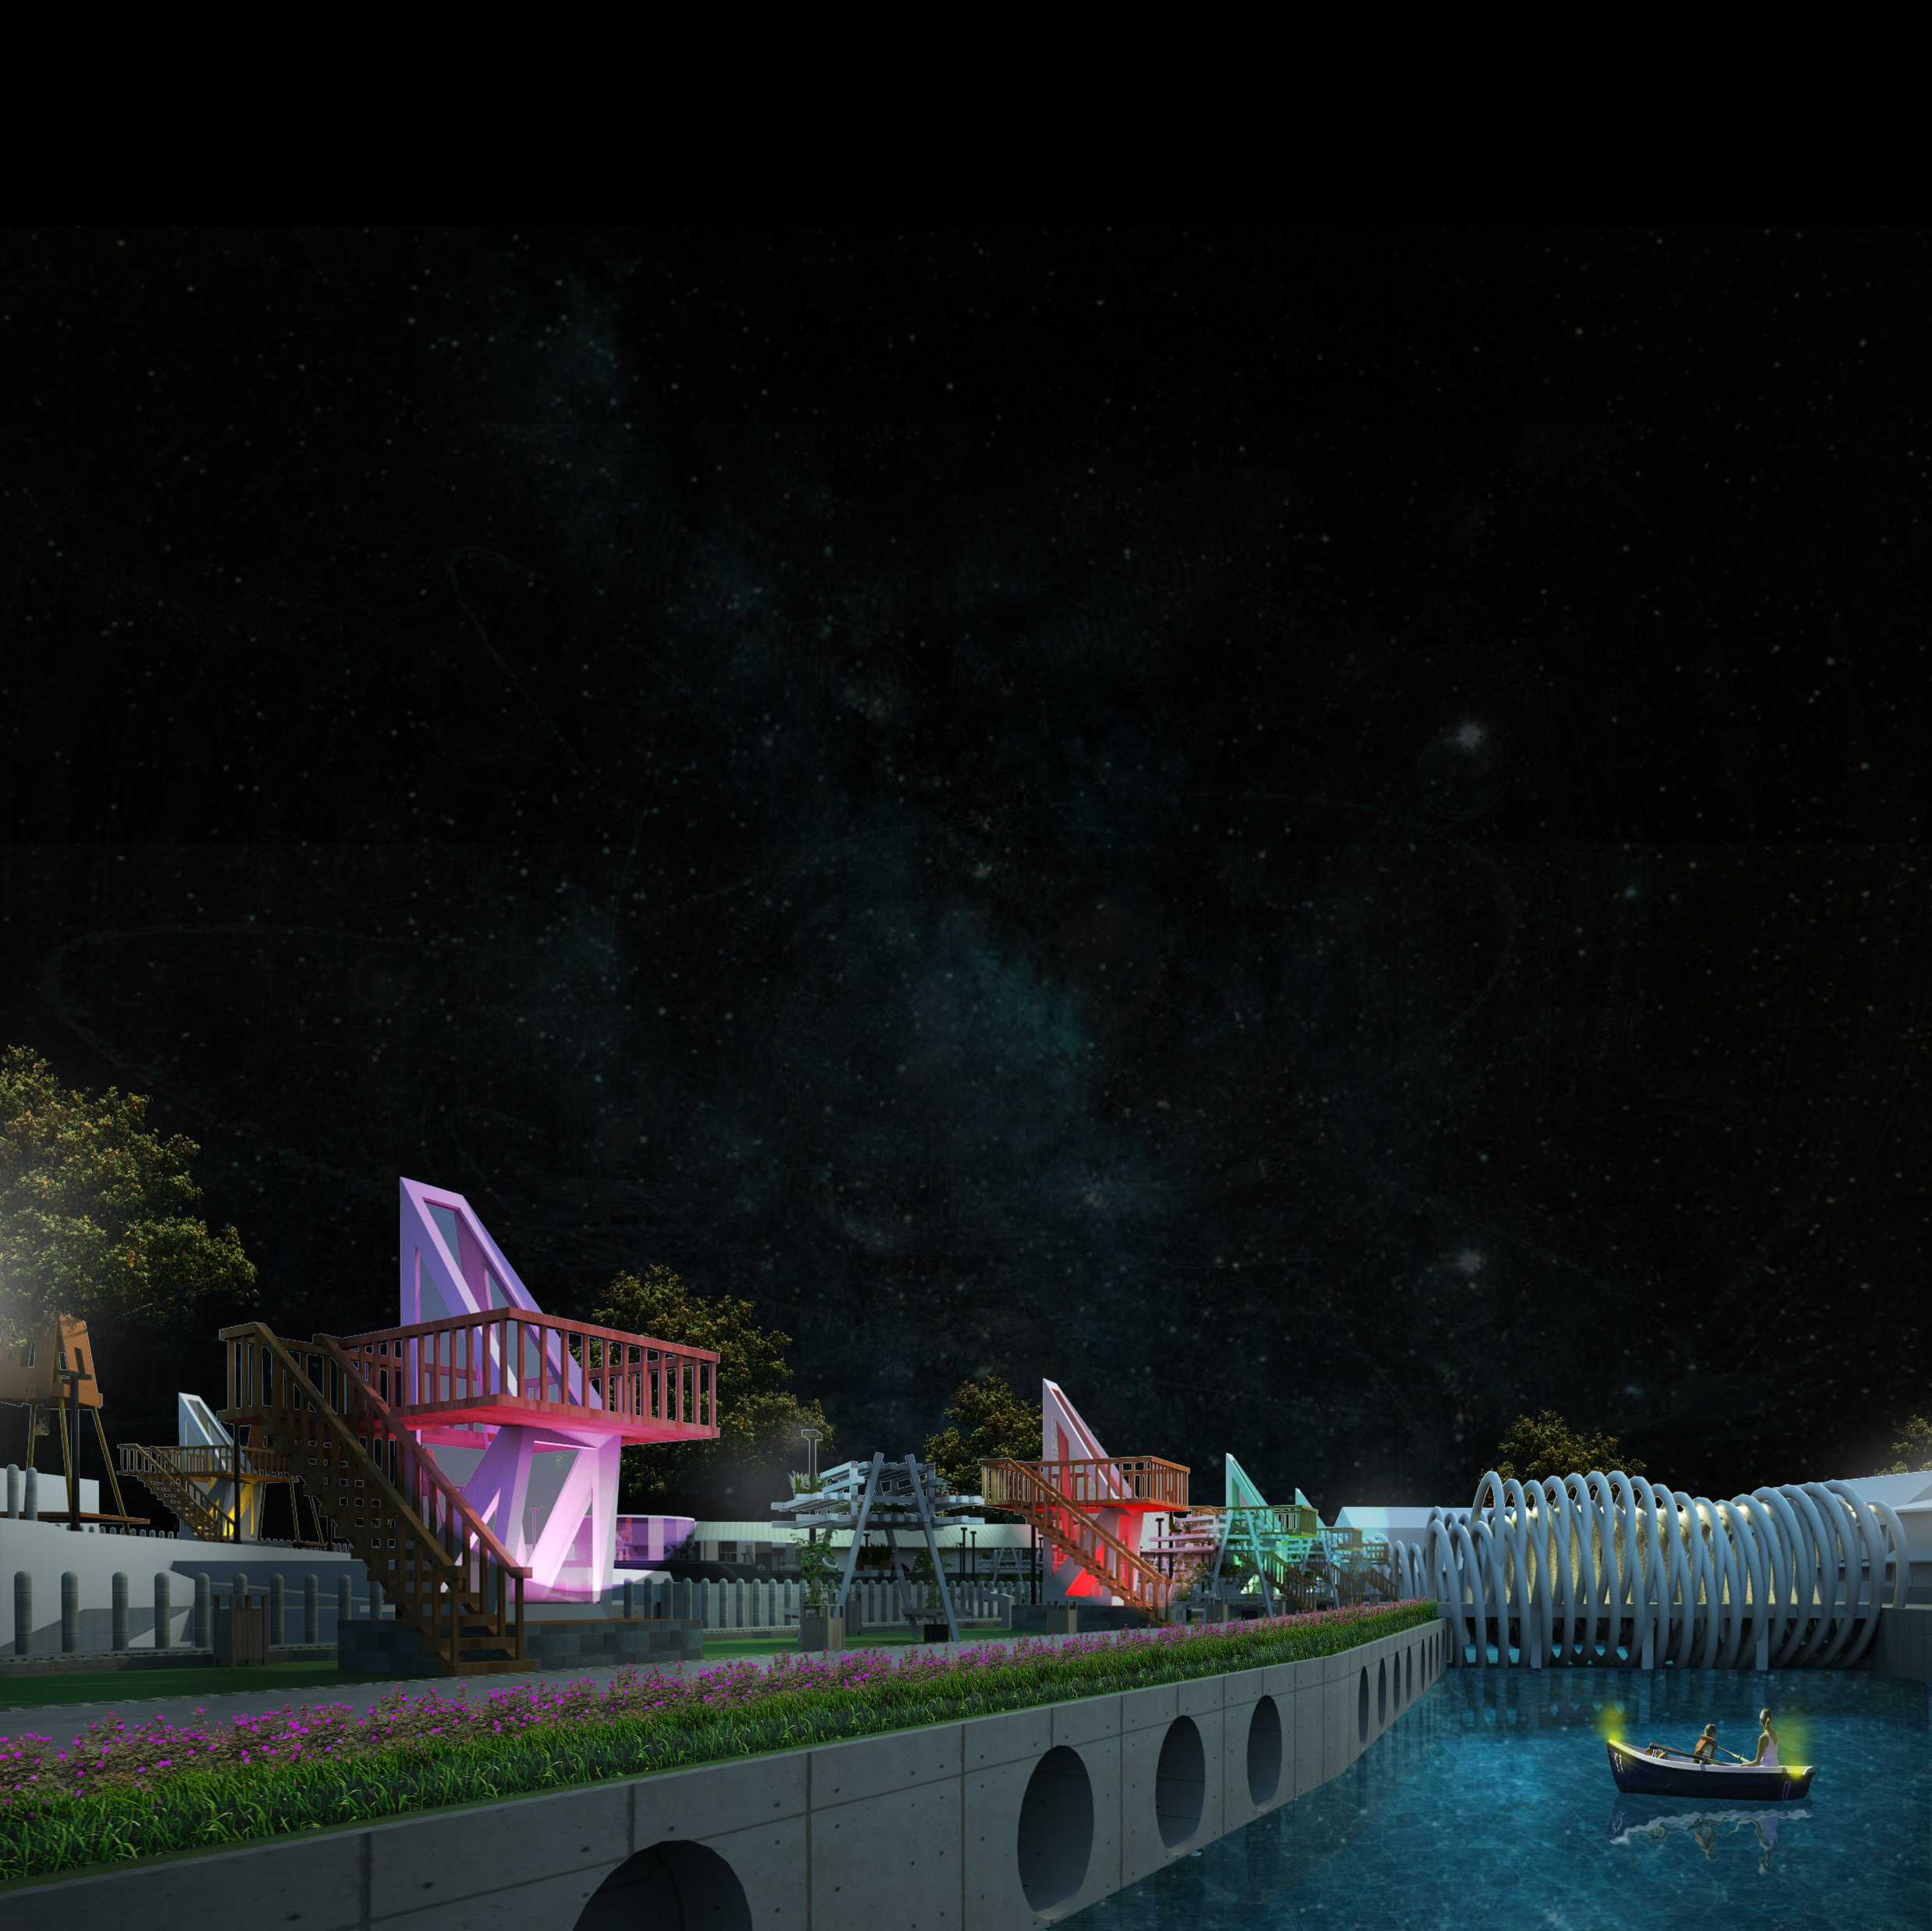 Aid - Alvian Imantaka Design Kali Semarang Riverfront Semarang, Kota Semarang, Jawa Tengah, Indonesia Semarang, Kota Semarang, Jawa Tengah, Indonesia Frontiersq   31278